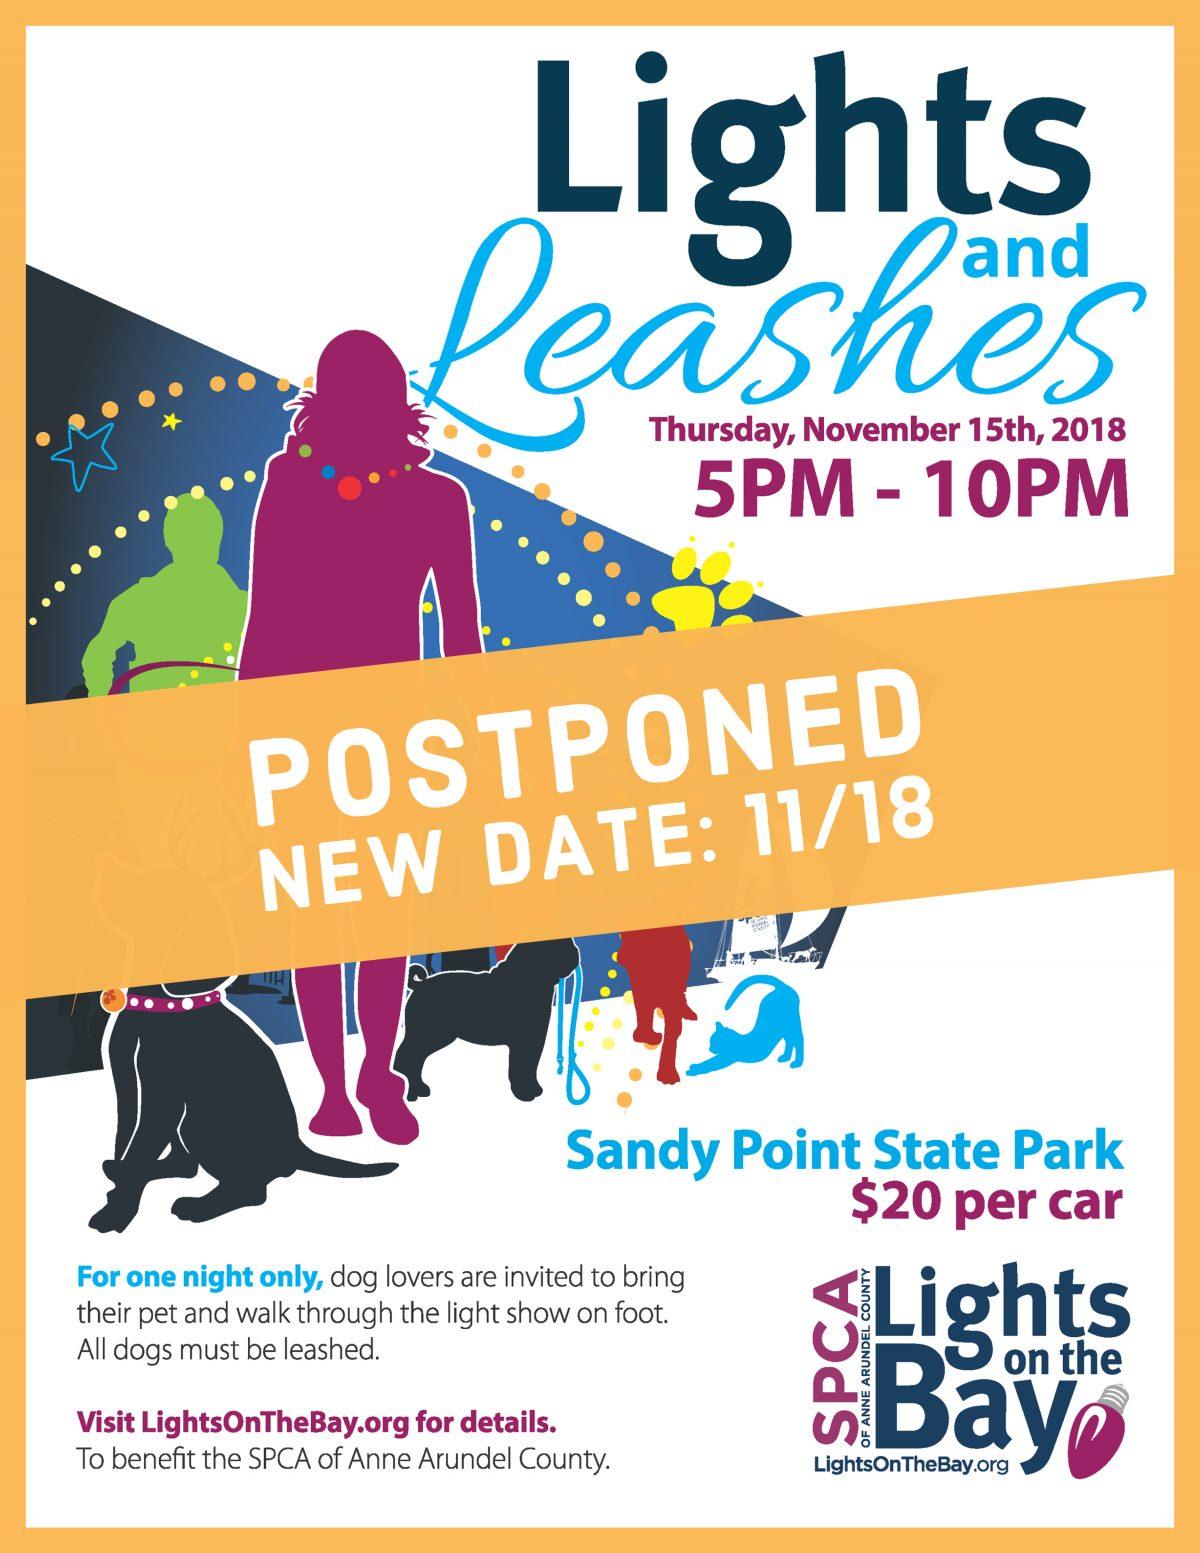 Lights & Leashes Postponed 11/18